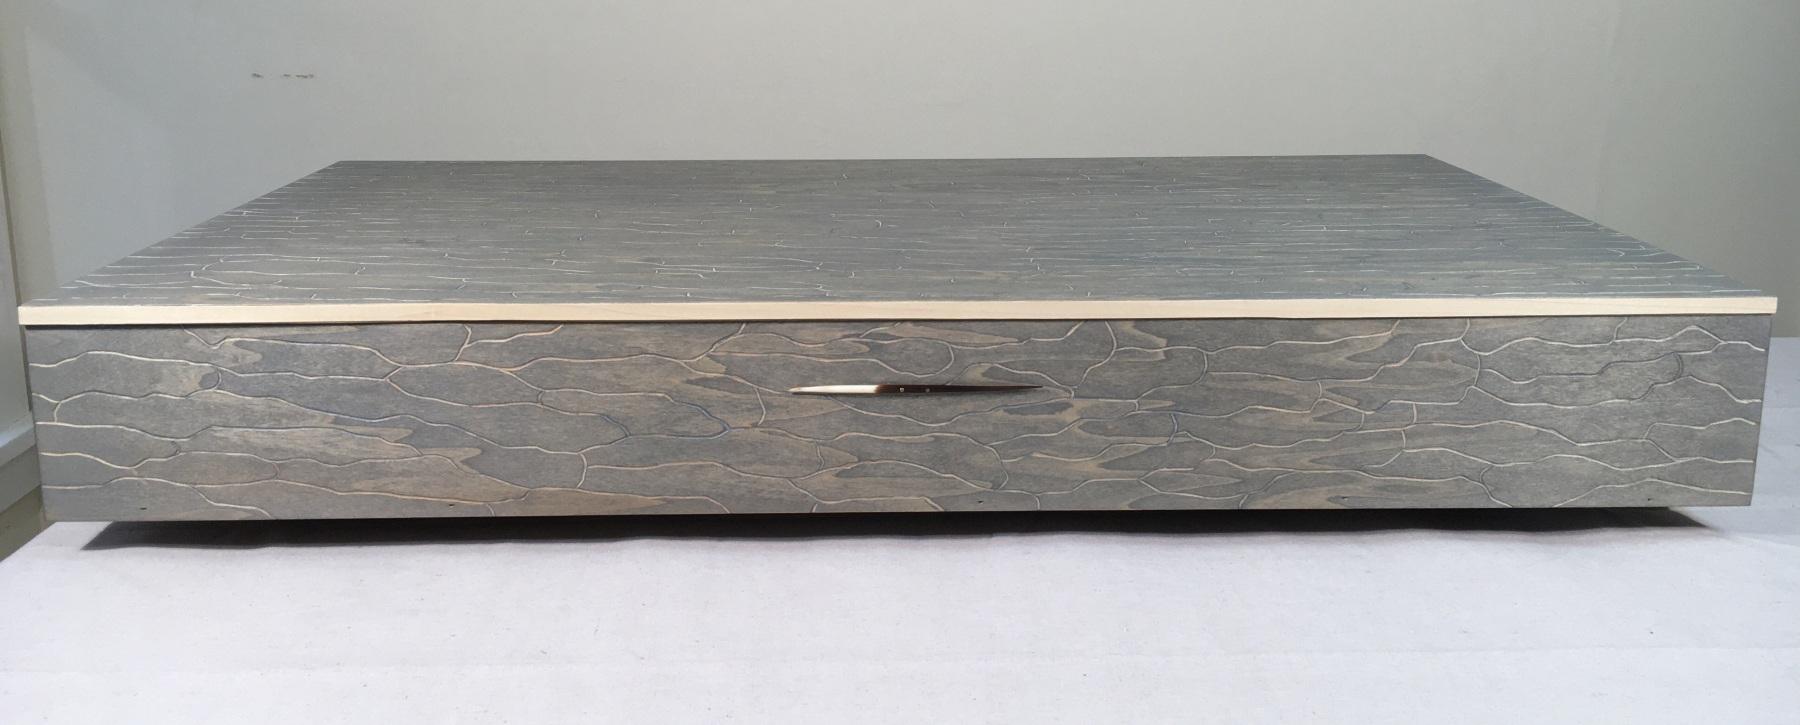 Pandora-Box-NorthAmerican-Porcupine-DangerMan.closedcropped